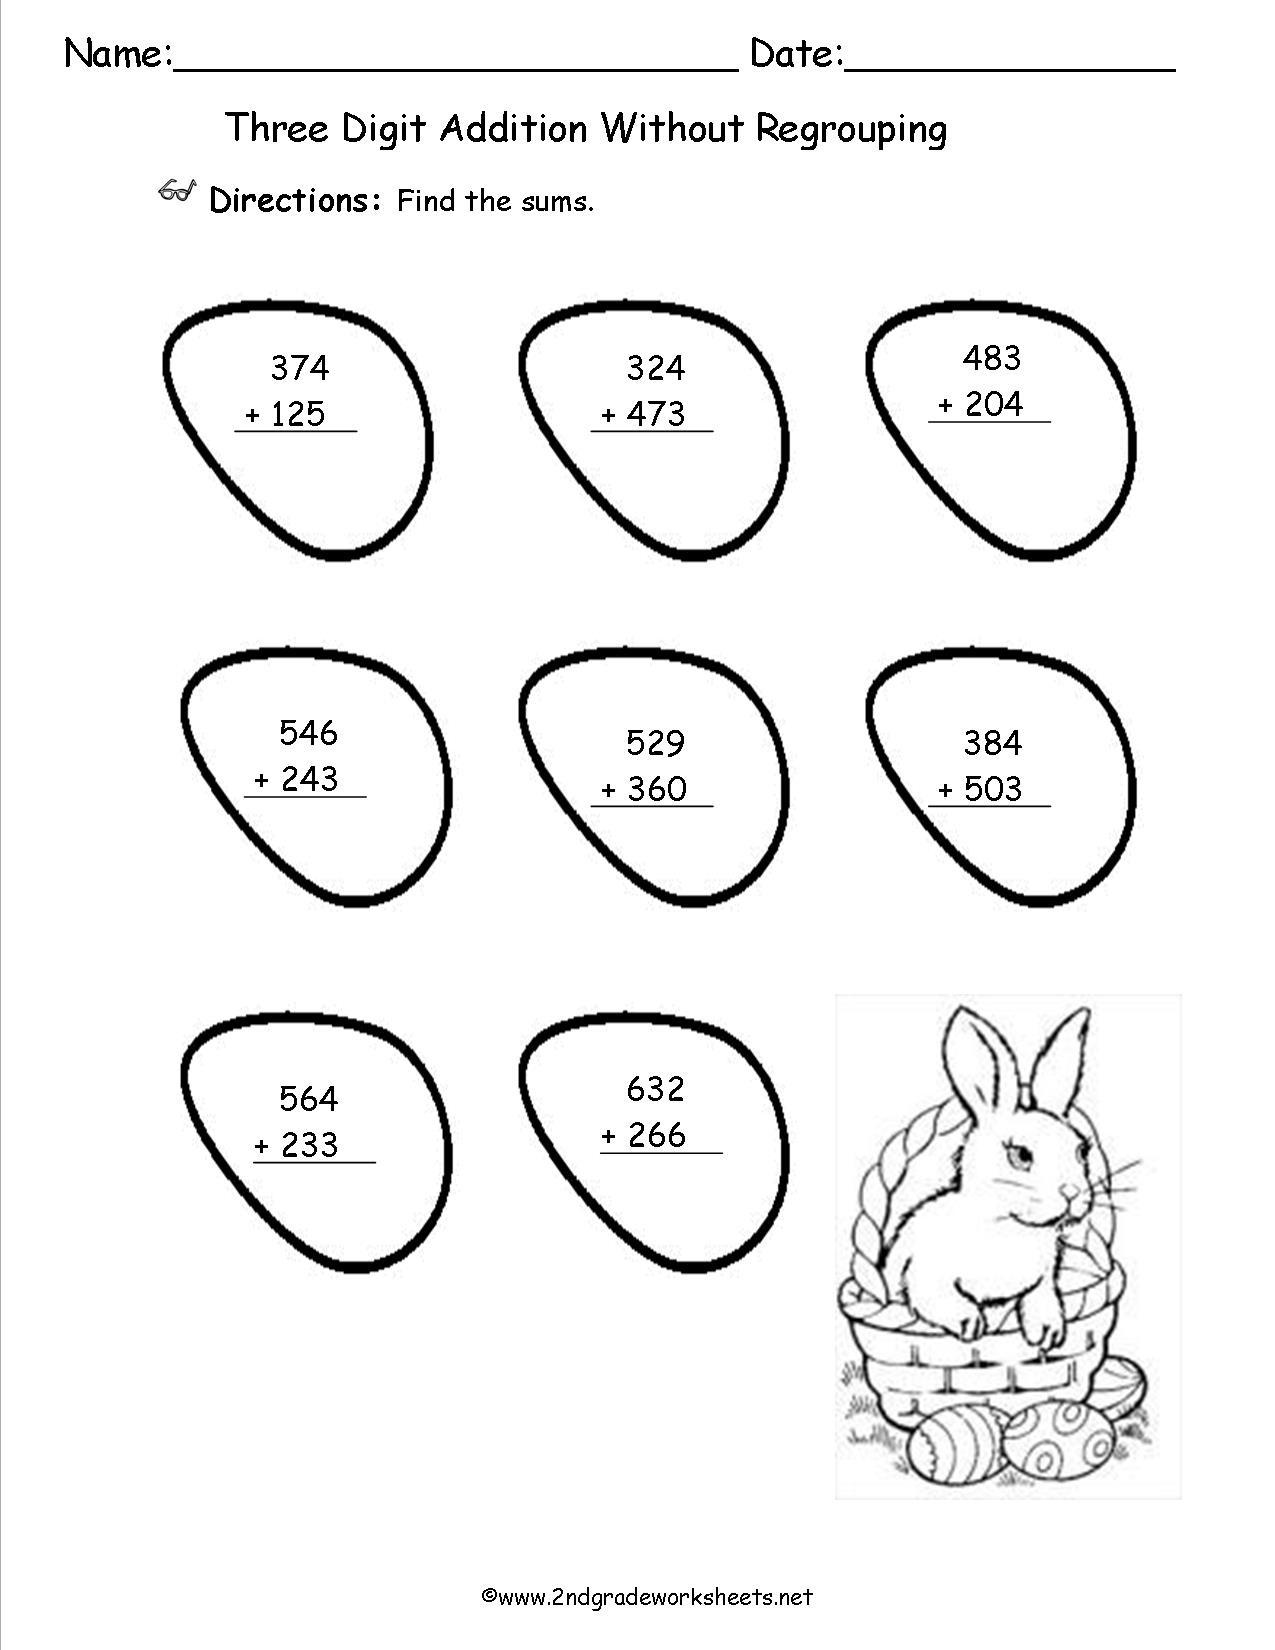 Free Printable Easter Worksheets For 3rd Grade